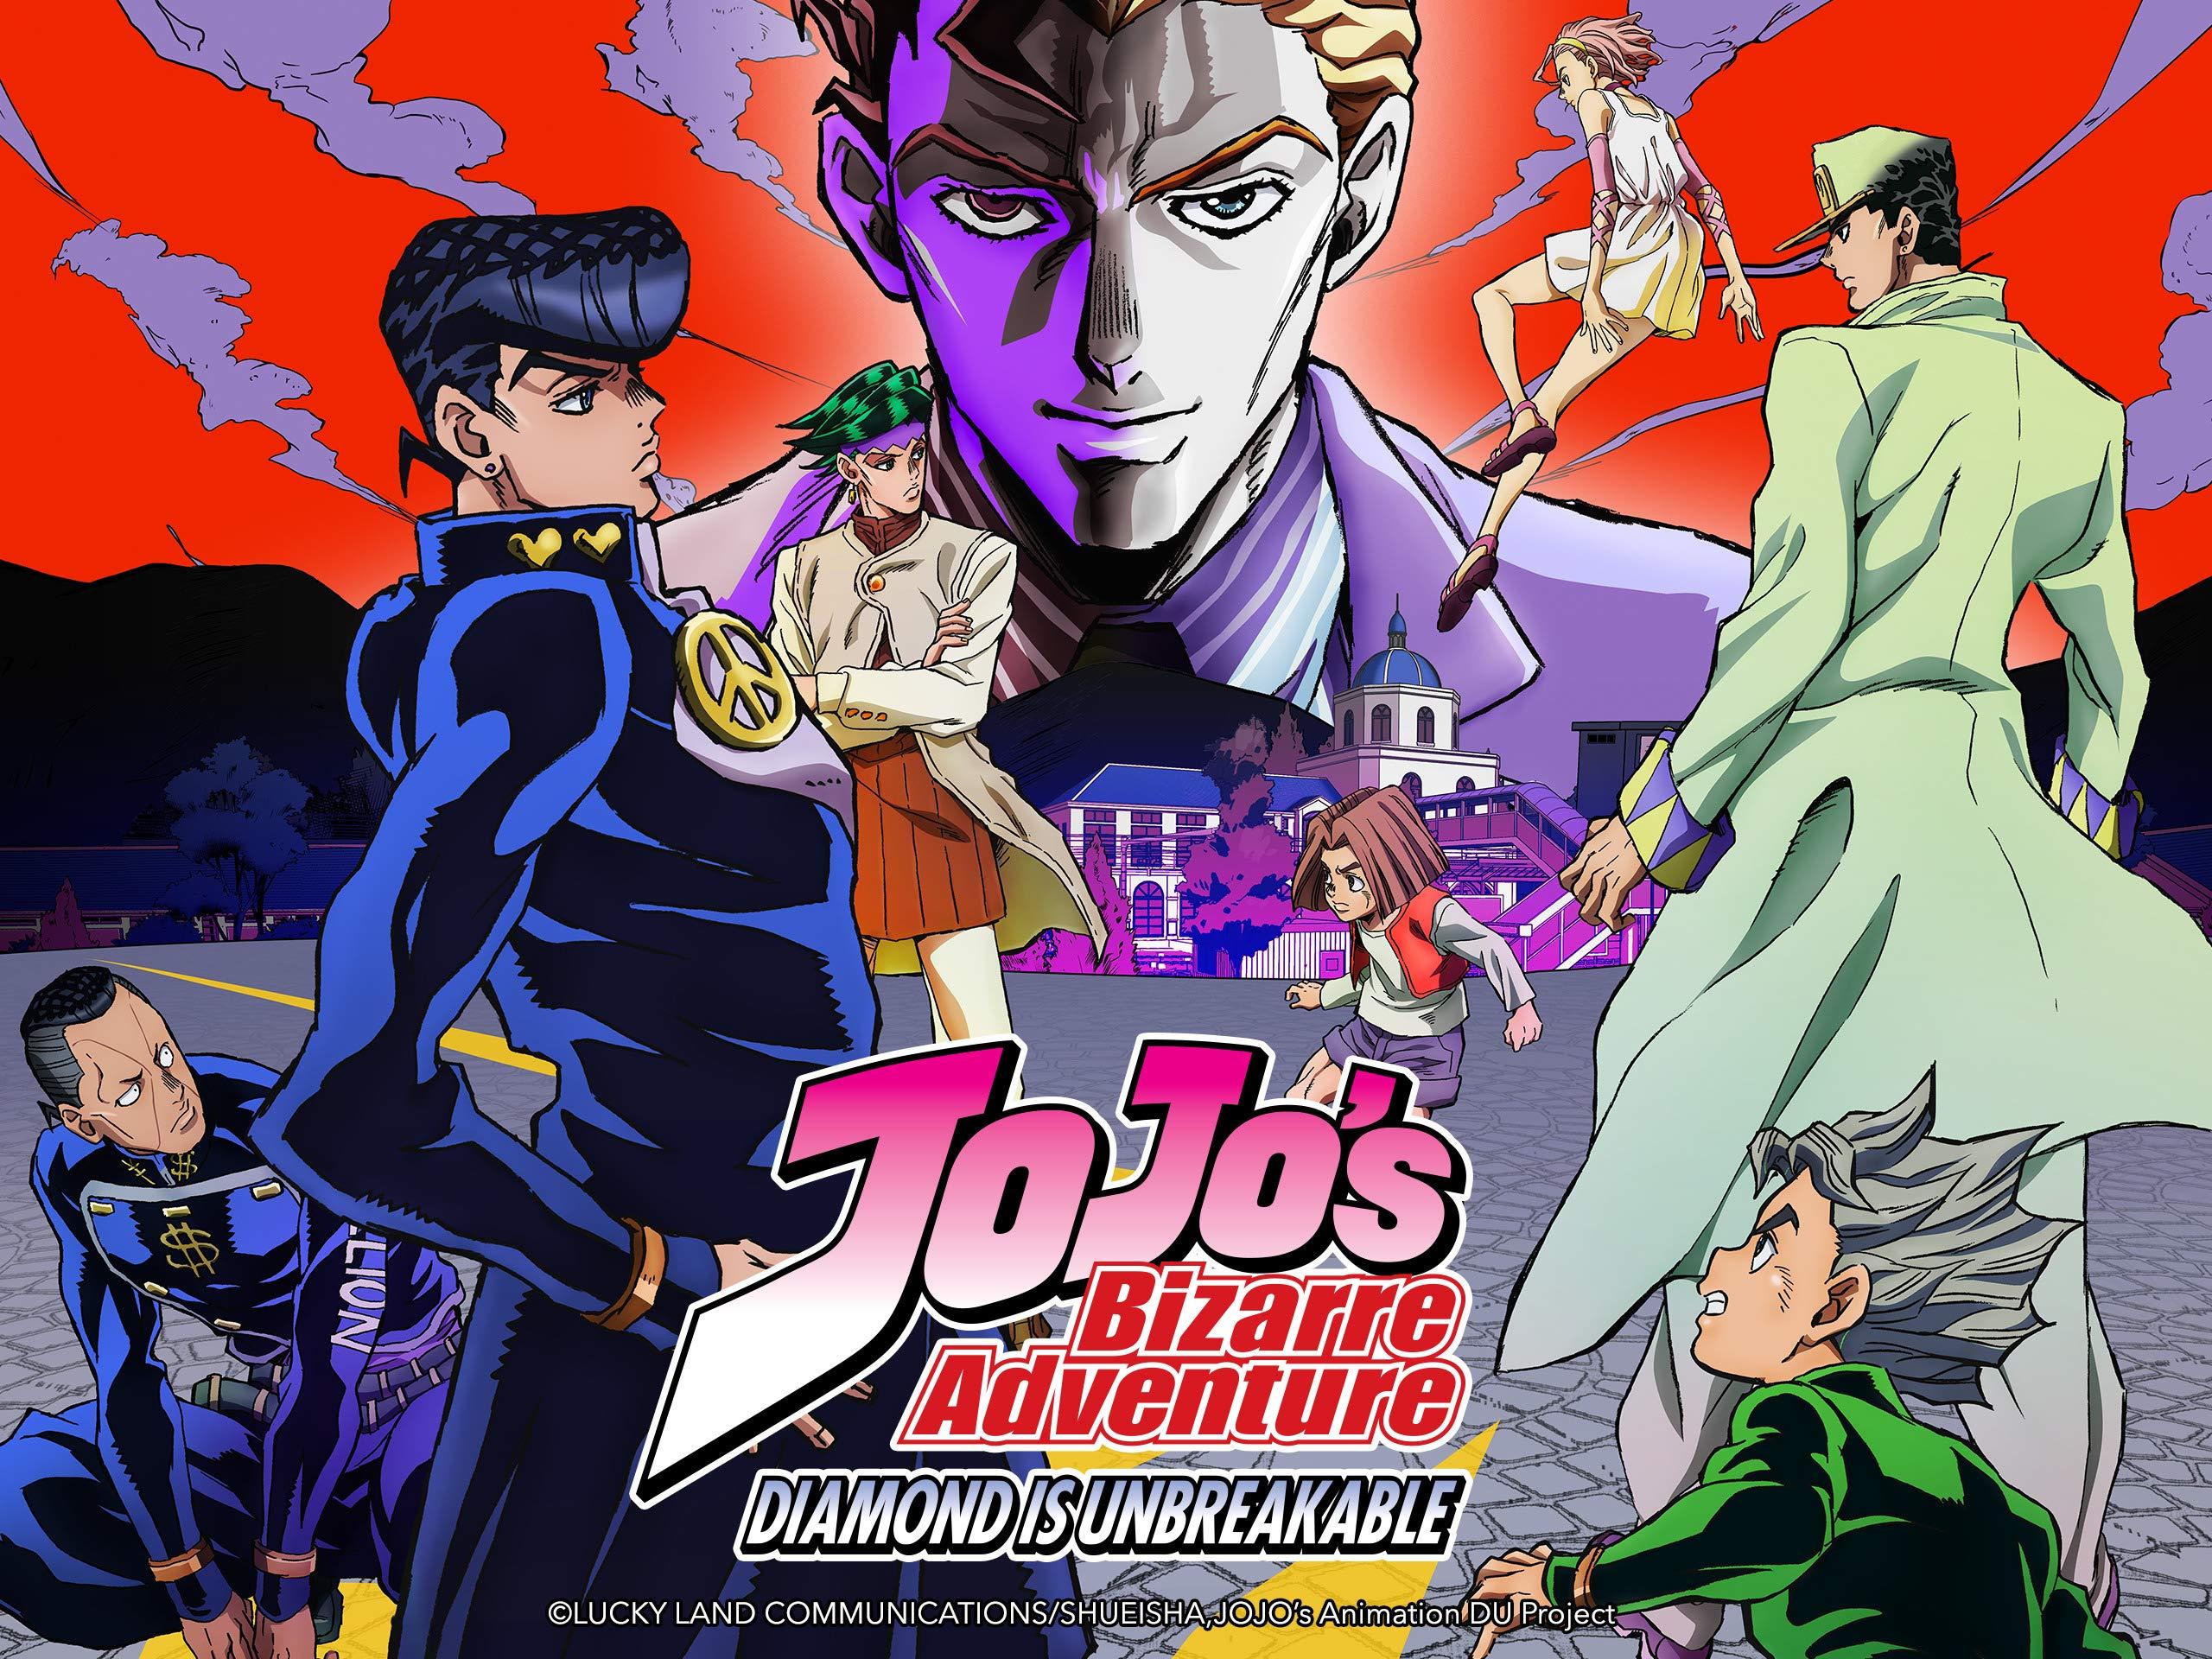 Watch Jojo S Bizarre Adventure Season 3 Volume 2 Diamond Is Unbreakable Prime Video